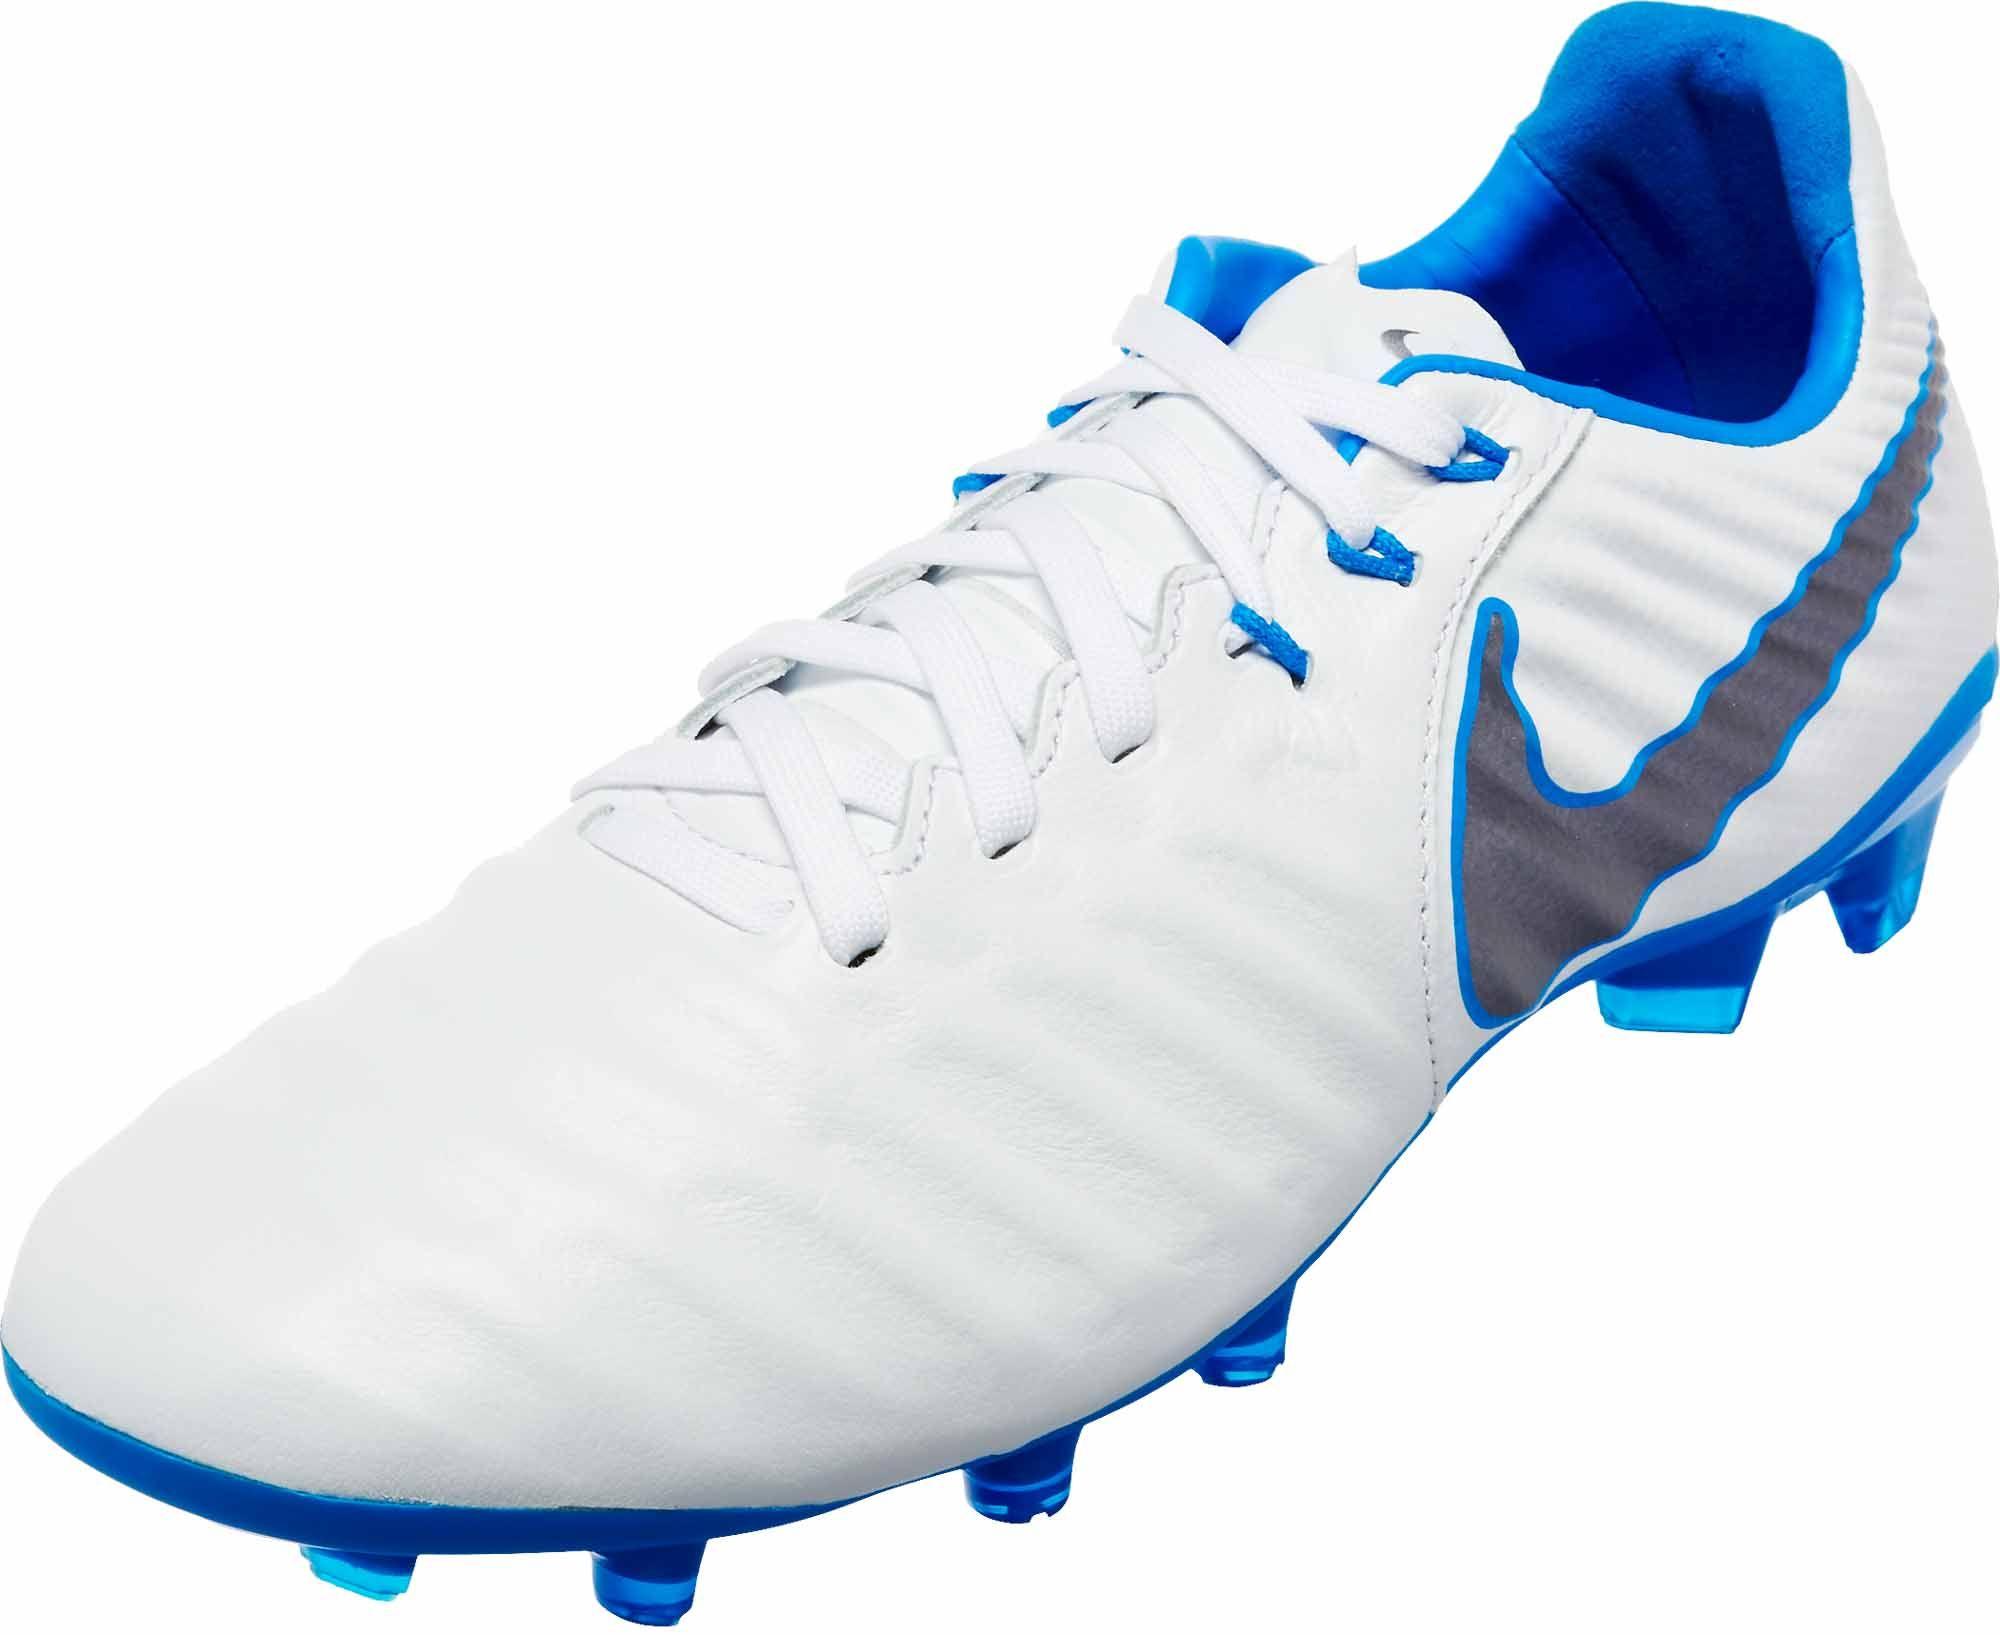 075c65d30d90 World Cup pack Just Do It Kids Nike Tiempo Legend VII Elite shoes. Hot at  SoccerPro!